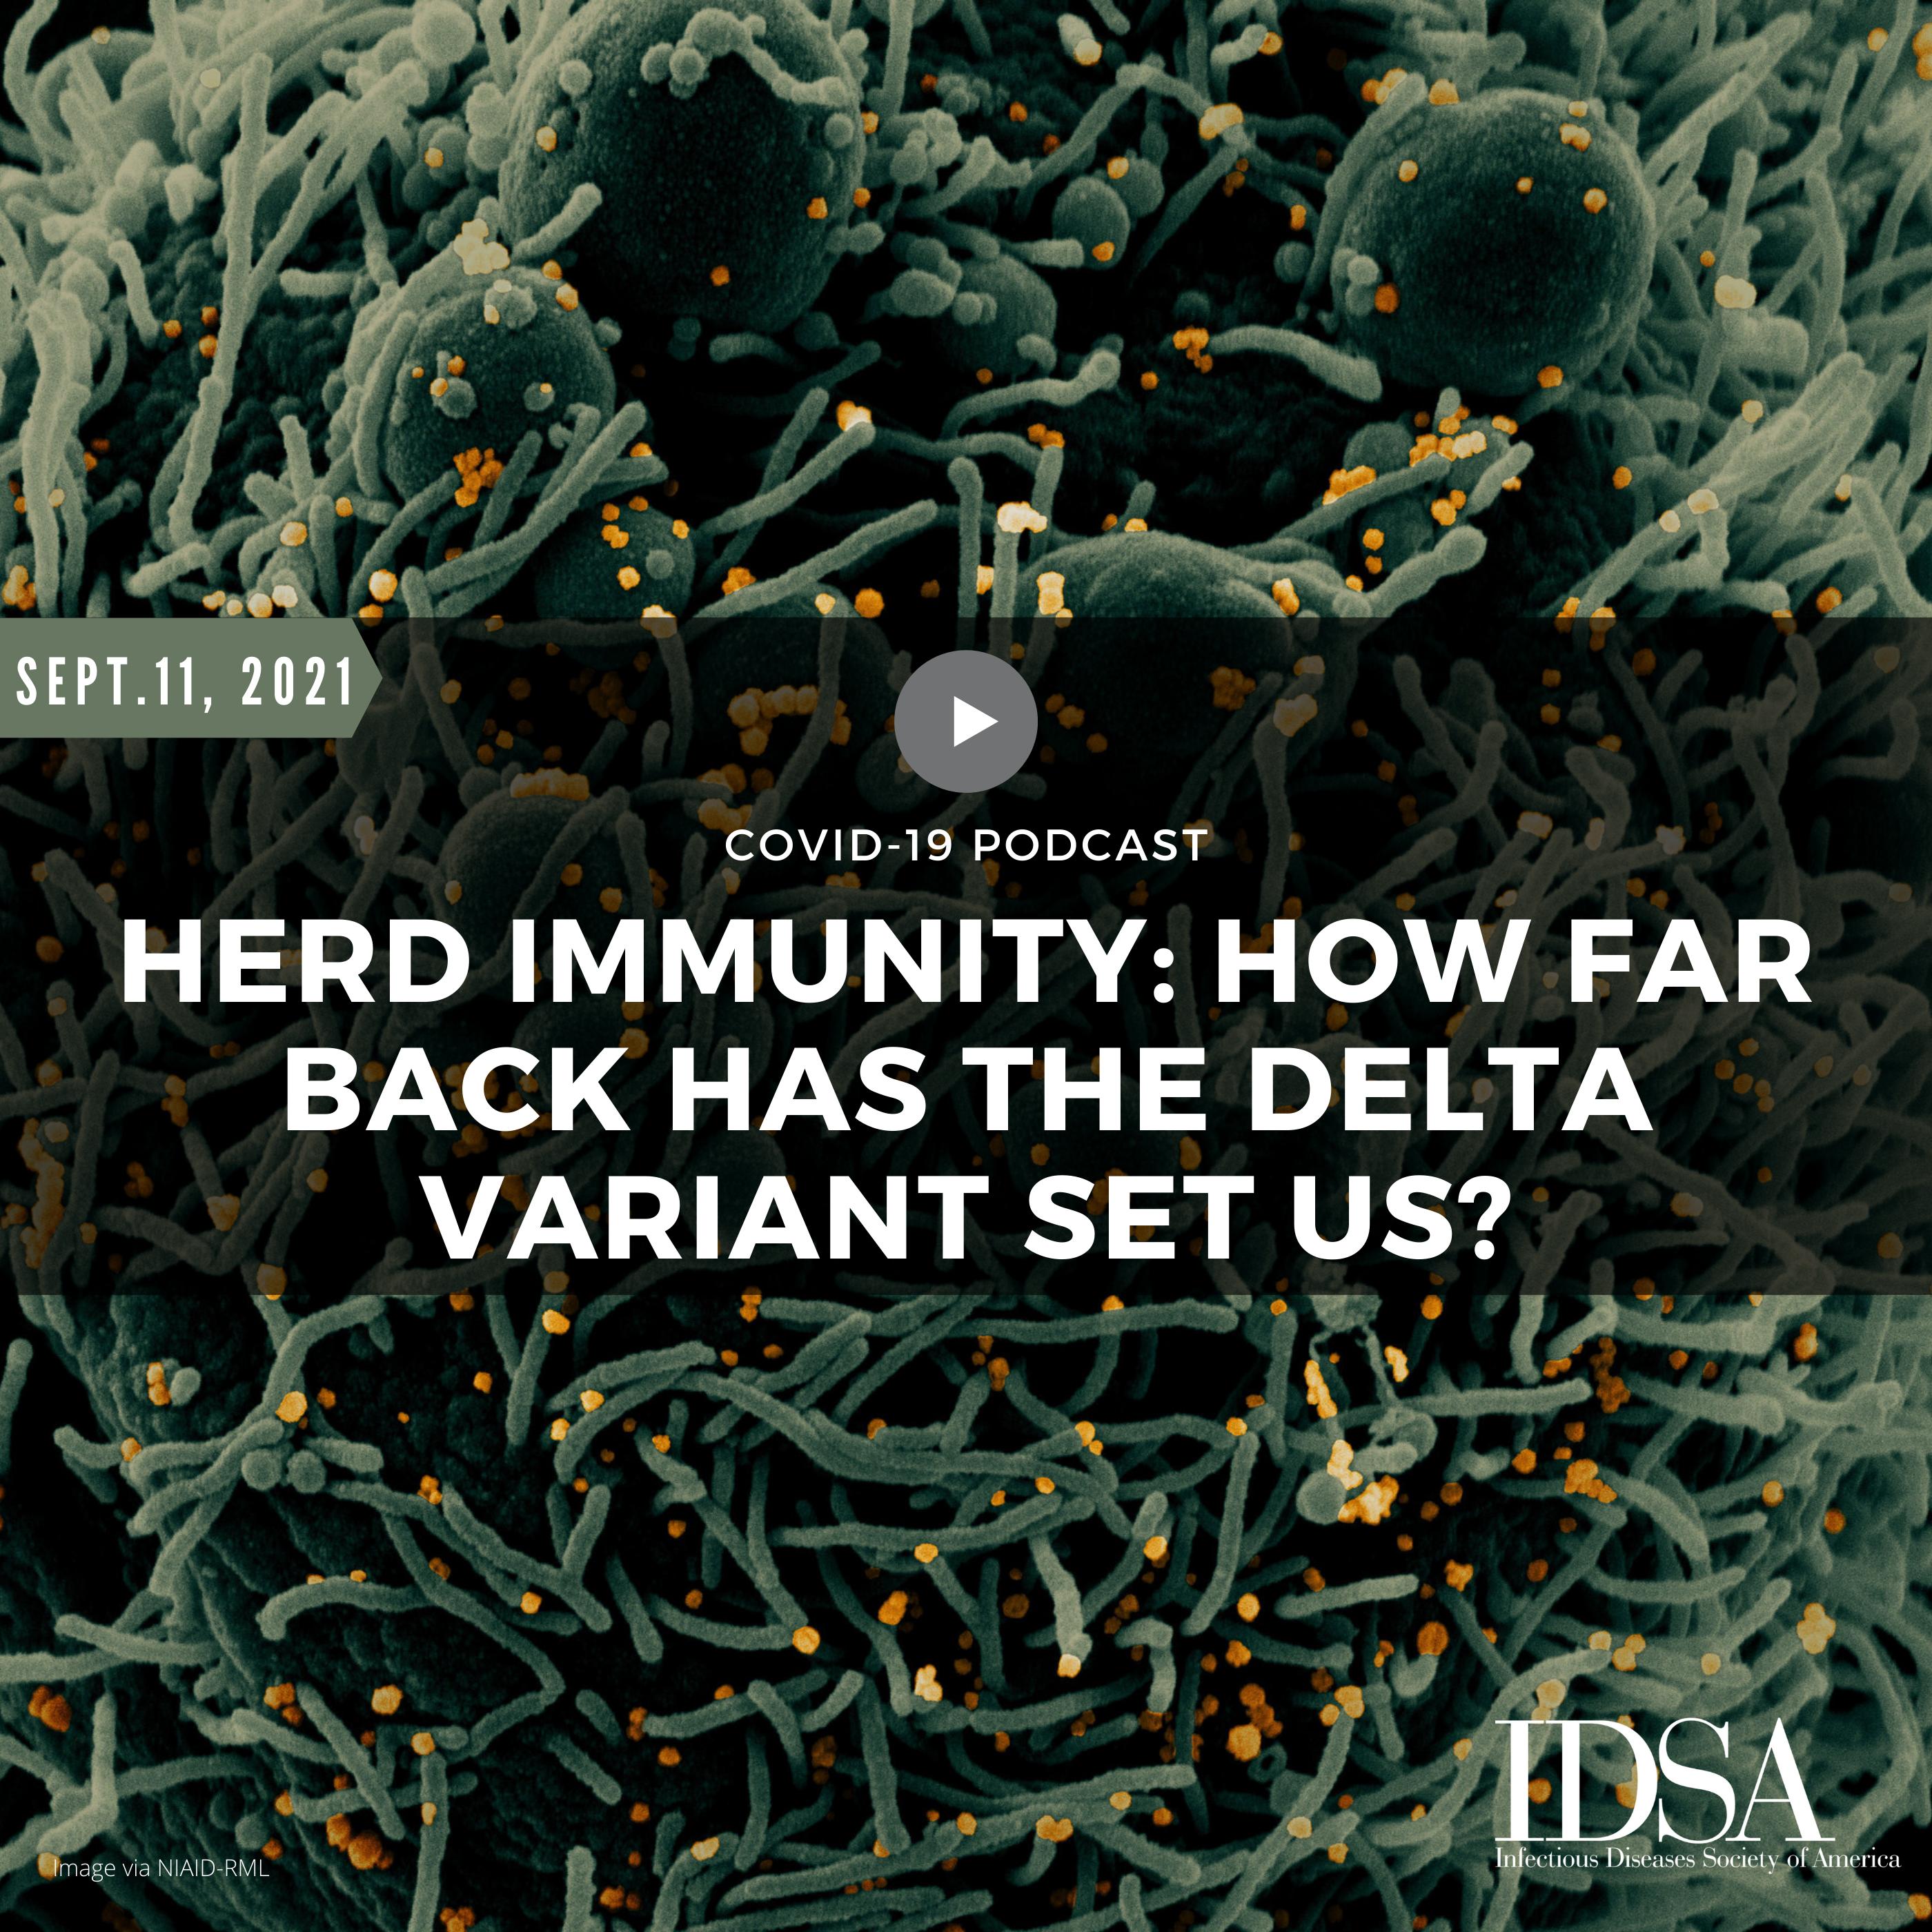 Herd Immunity: How Far Back Has the Delta Variant Set Us?